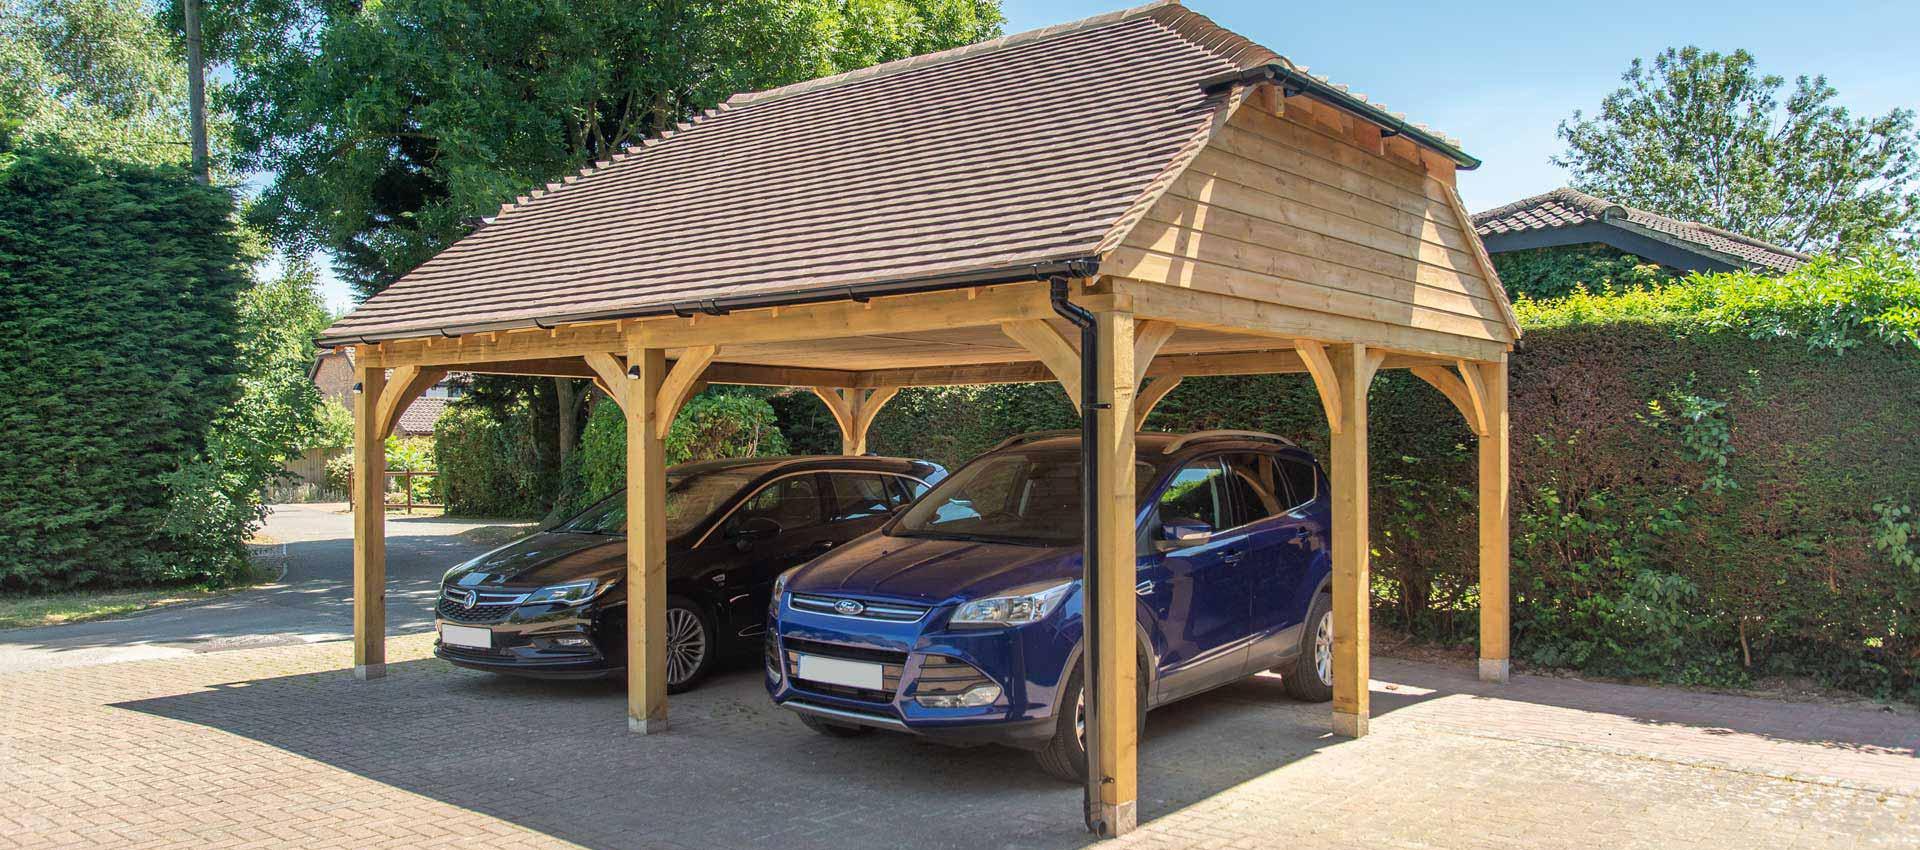 Case Study Bespoke Timber Carport